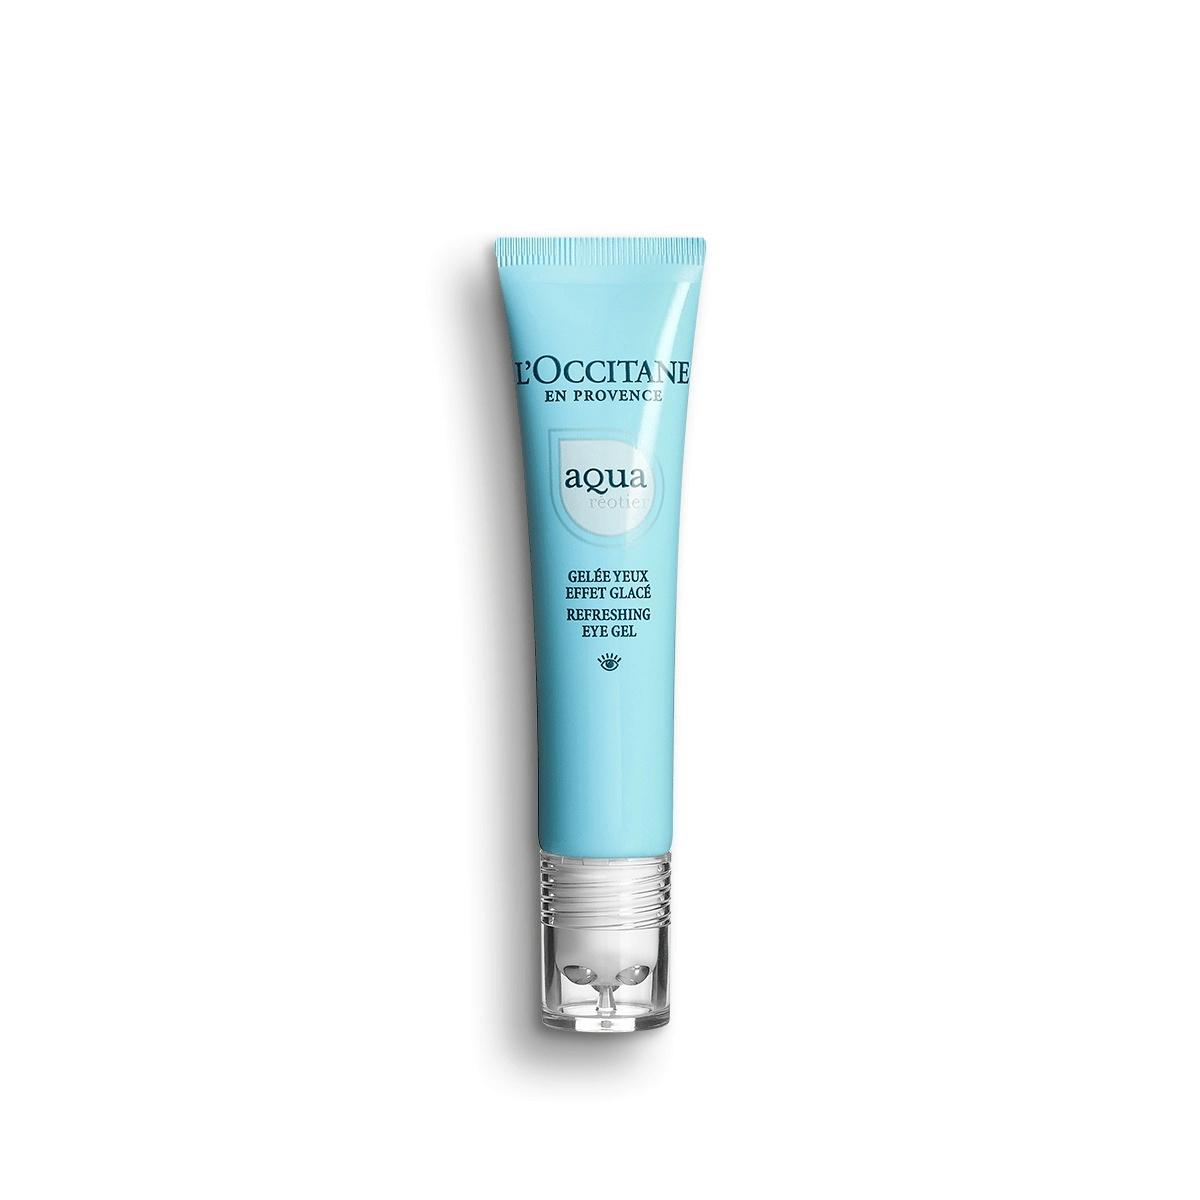 Aqua Reotier Cooling Eye Gel - Aqua Reotier Canlandırıcı Göz Jeli 15 ml